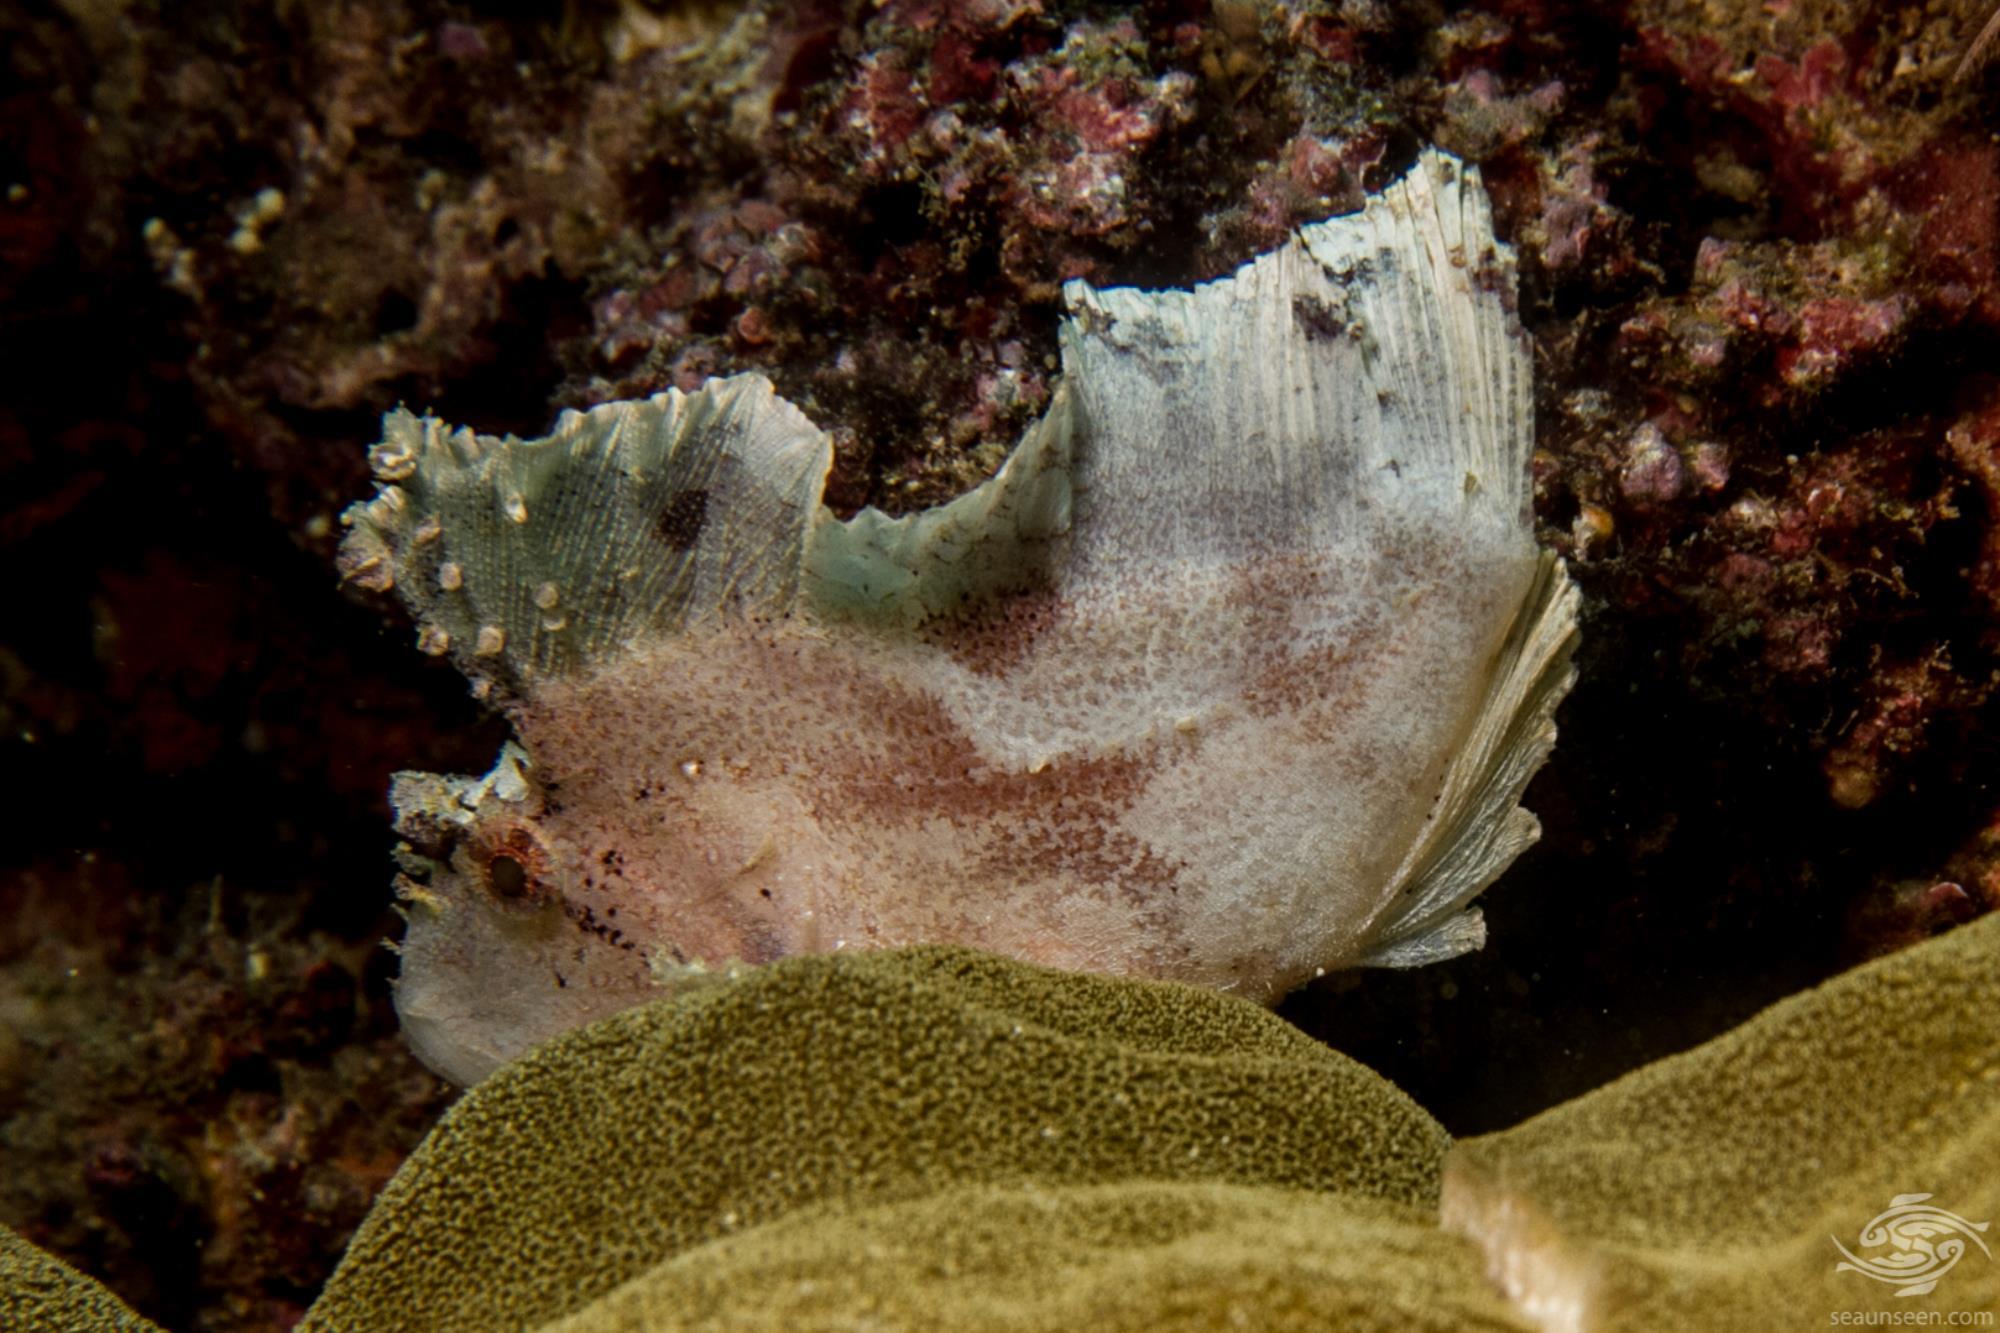 Leaf scorpionfish Taenianotus triacanthus or Paperfish